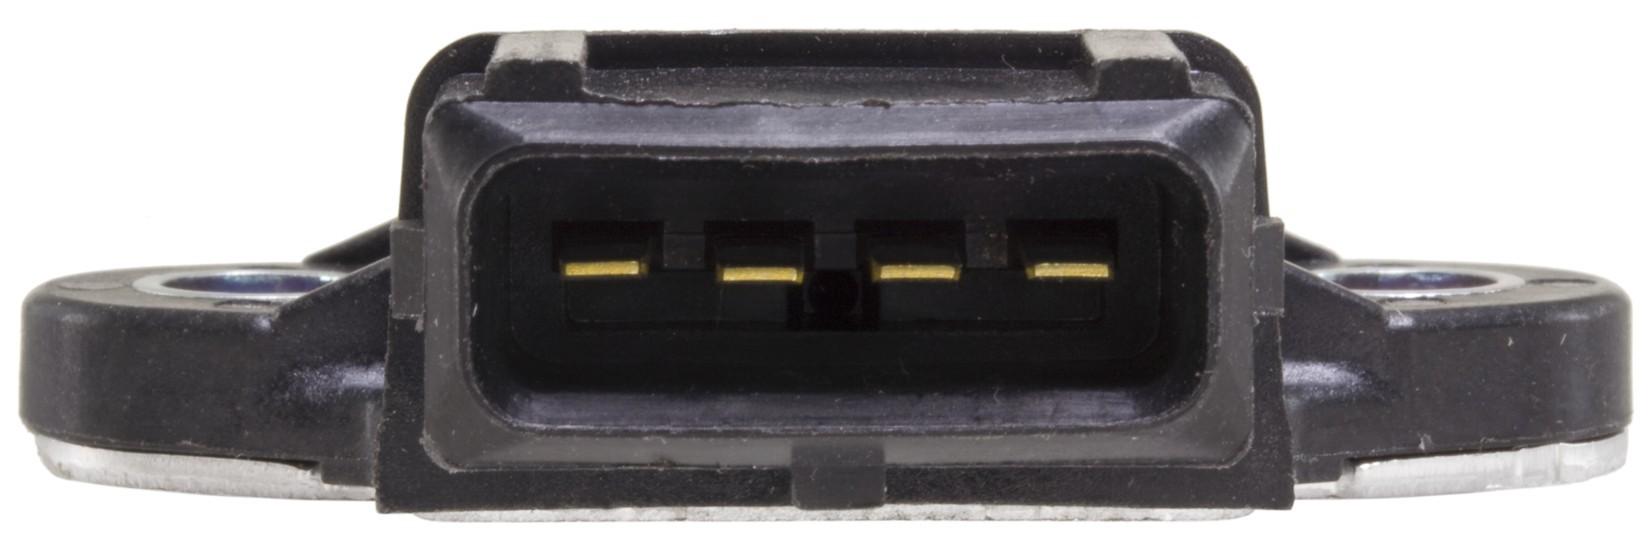 Signal Wiring Diagram Additionally 67 Mustang Headlight Wiring Harness